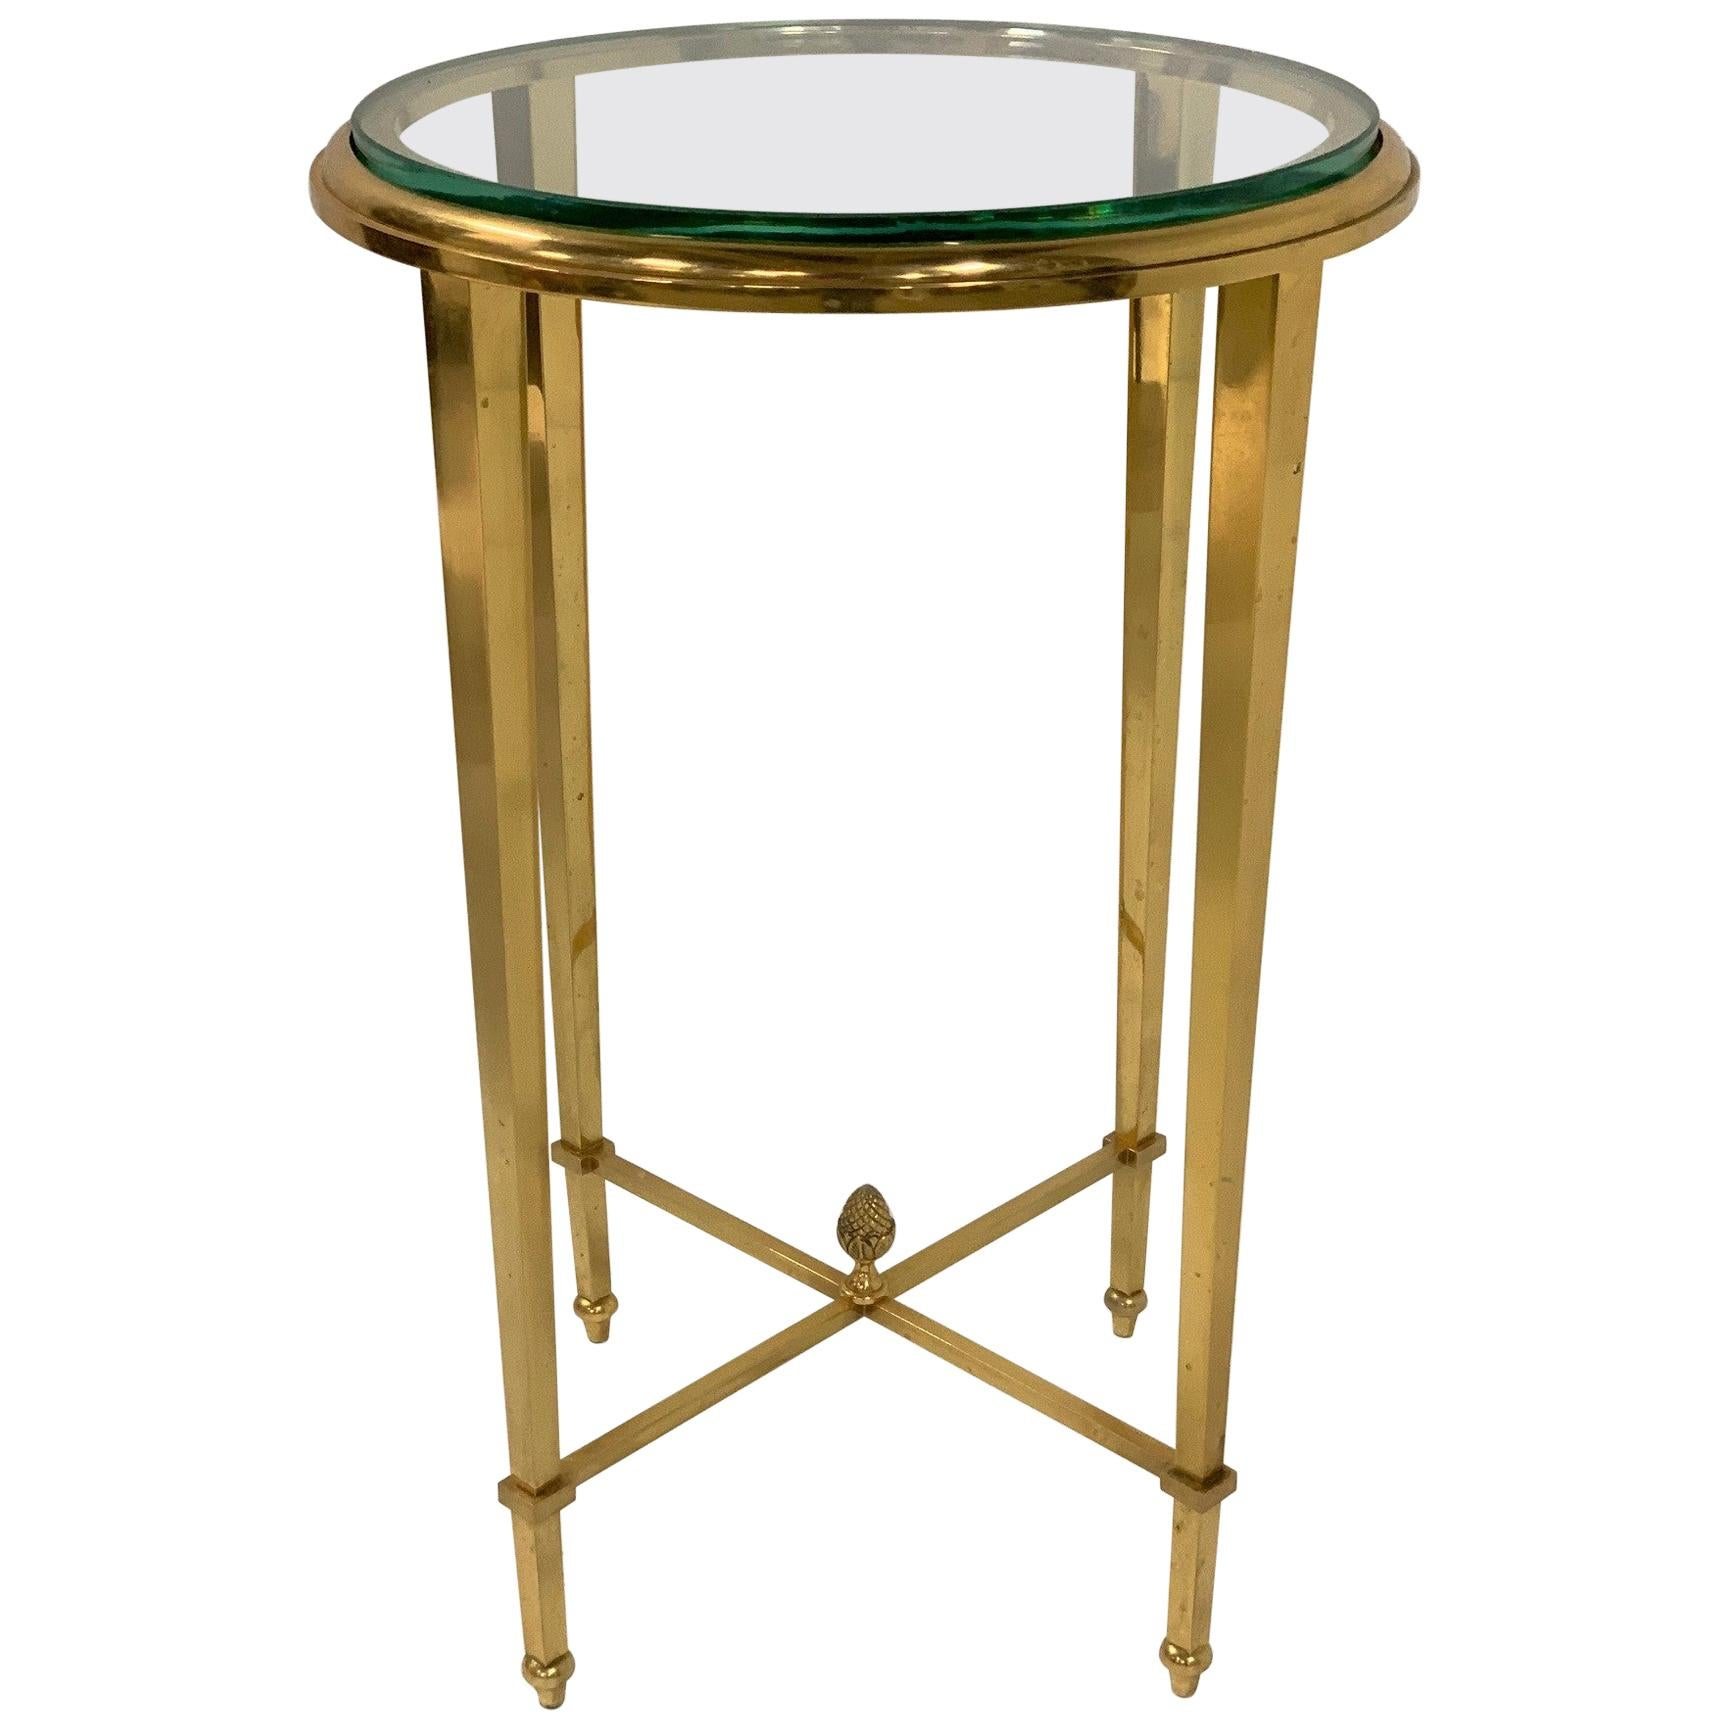 French Gilt Bronze and Glass Guéridon Table